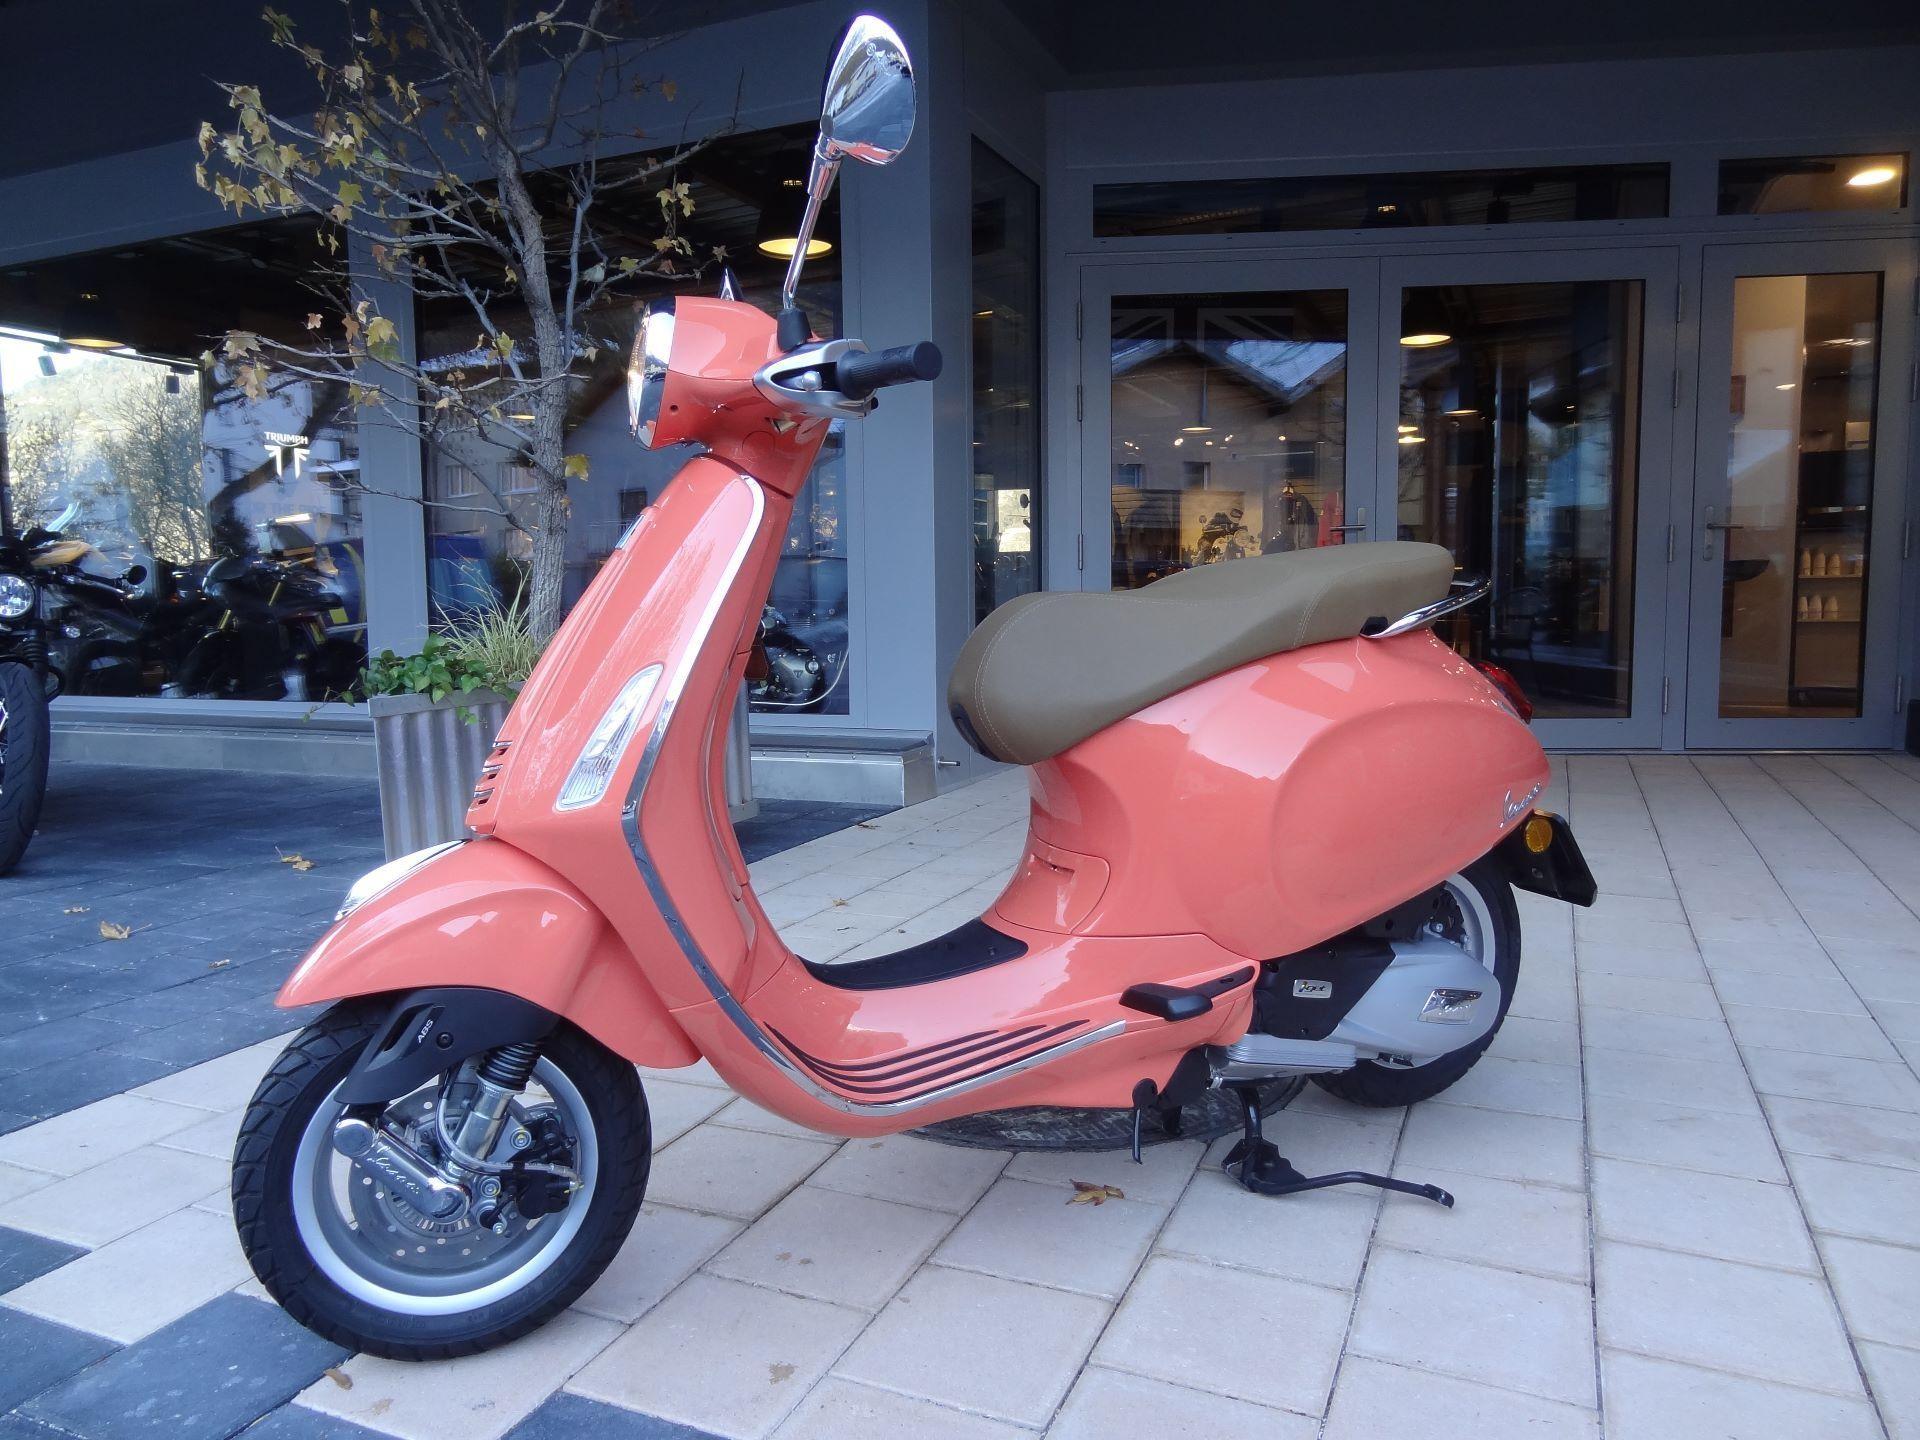 moto d monstration acheter piaggio vespa primavera 125 abs iget holzer motos ag glis. Black Bedroom Furniture Sets. Home Design Ideas